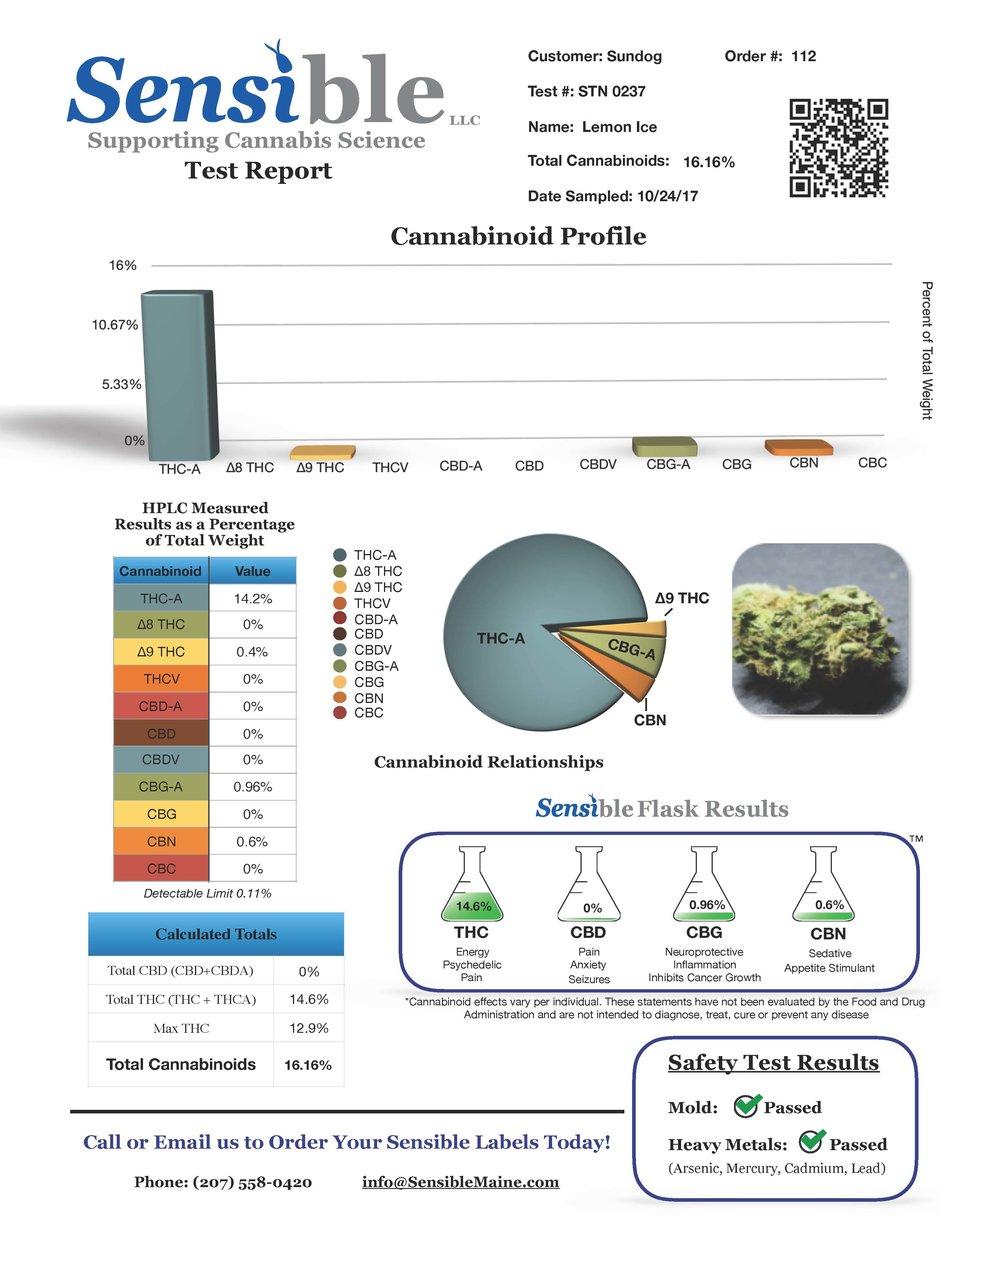 Test Report stn0237.jpg